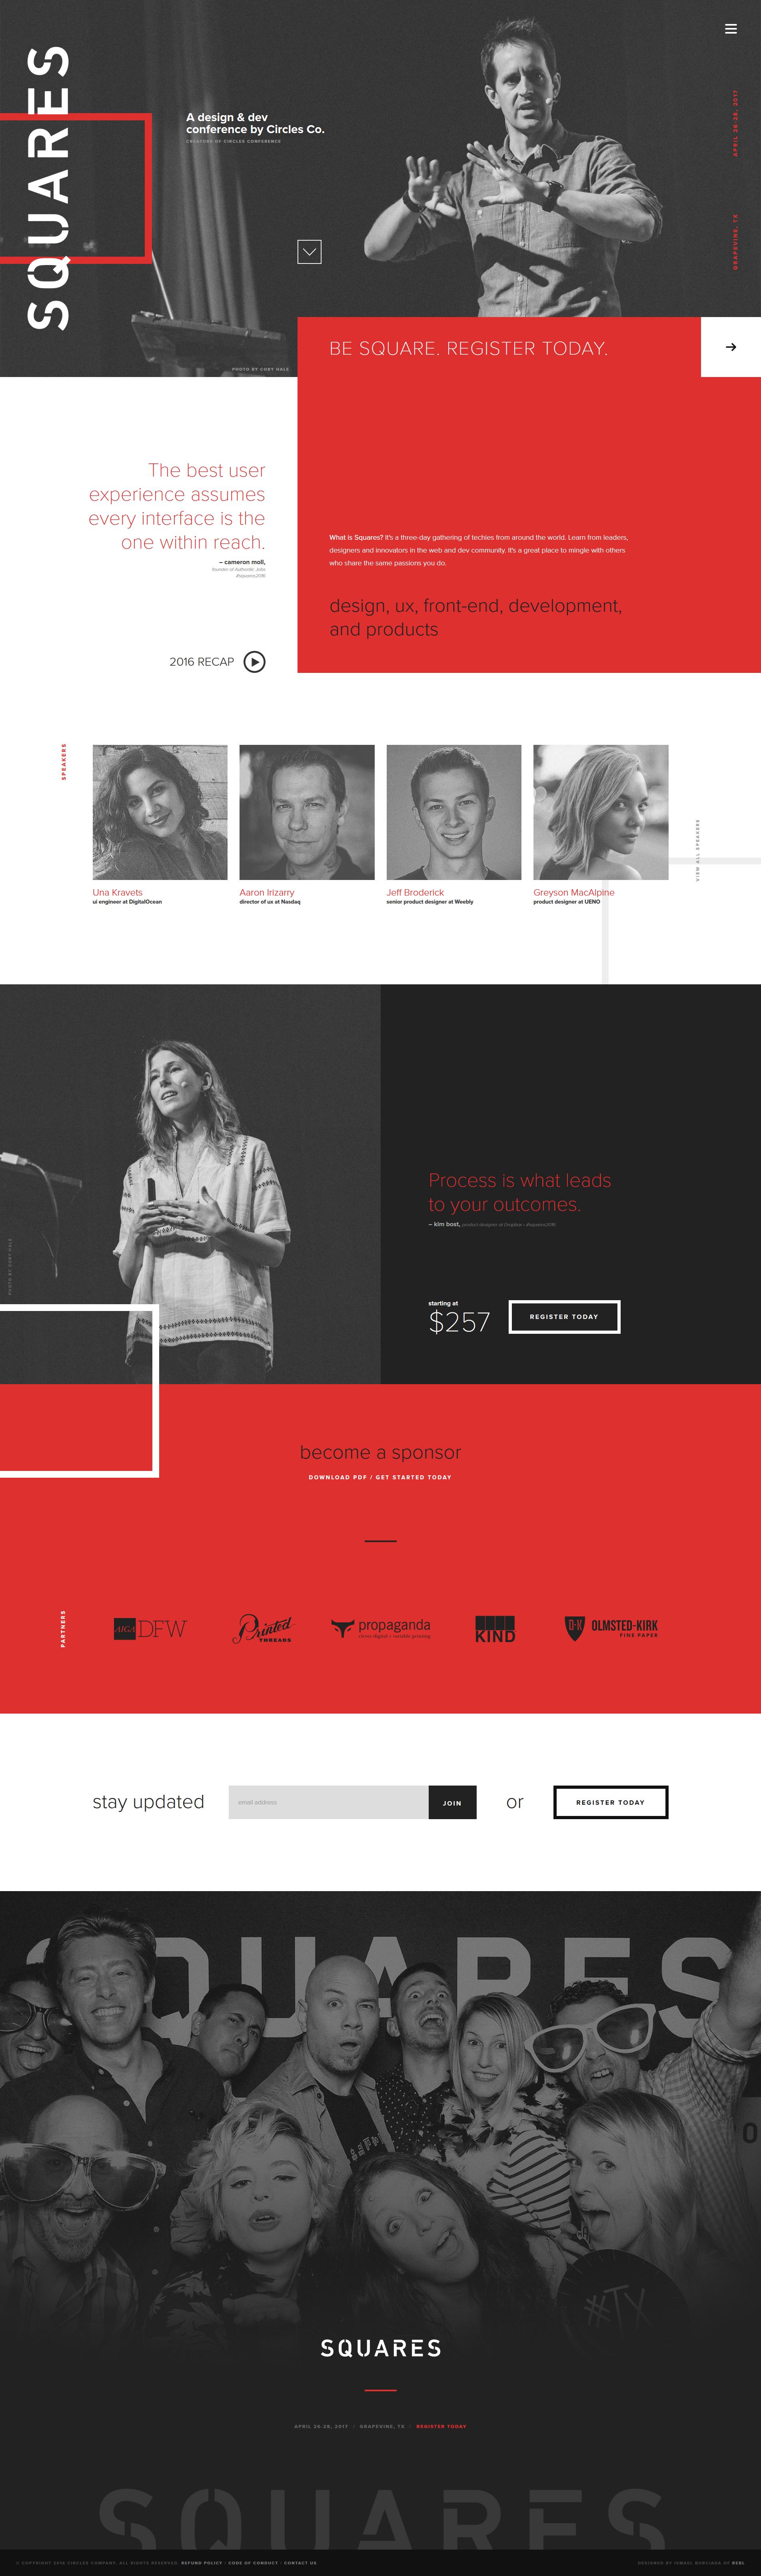 Pin By Irwan Wijaya On Cariaja Ref Web Graphic Design Unique Web Design Web Layout Design